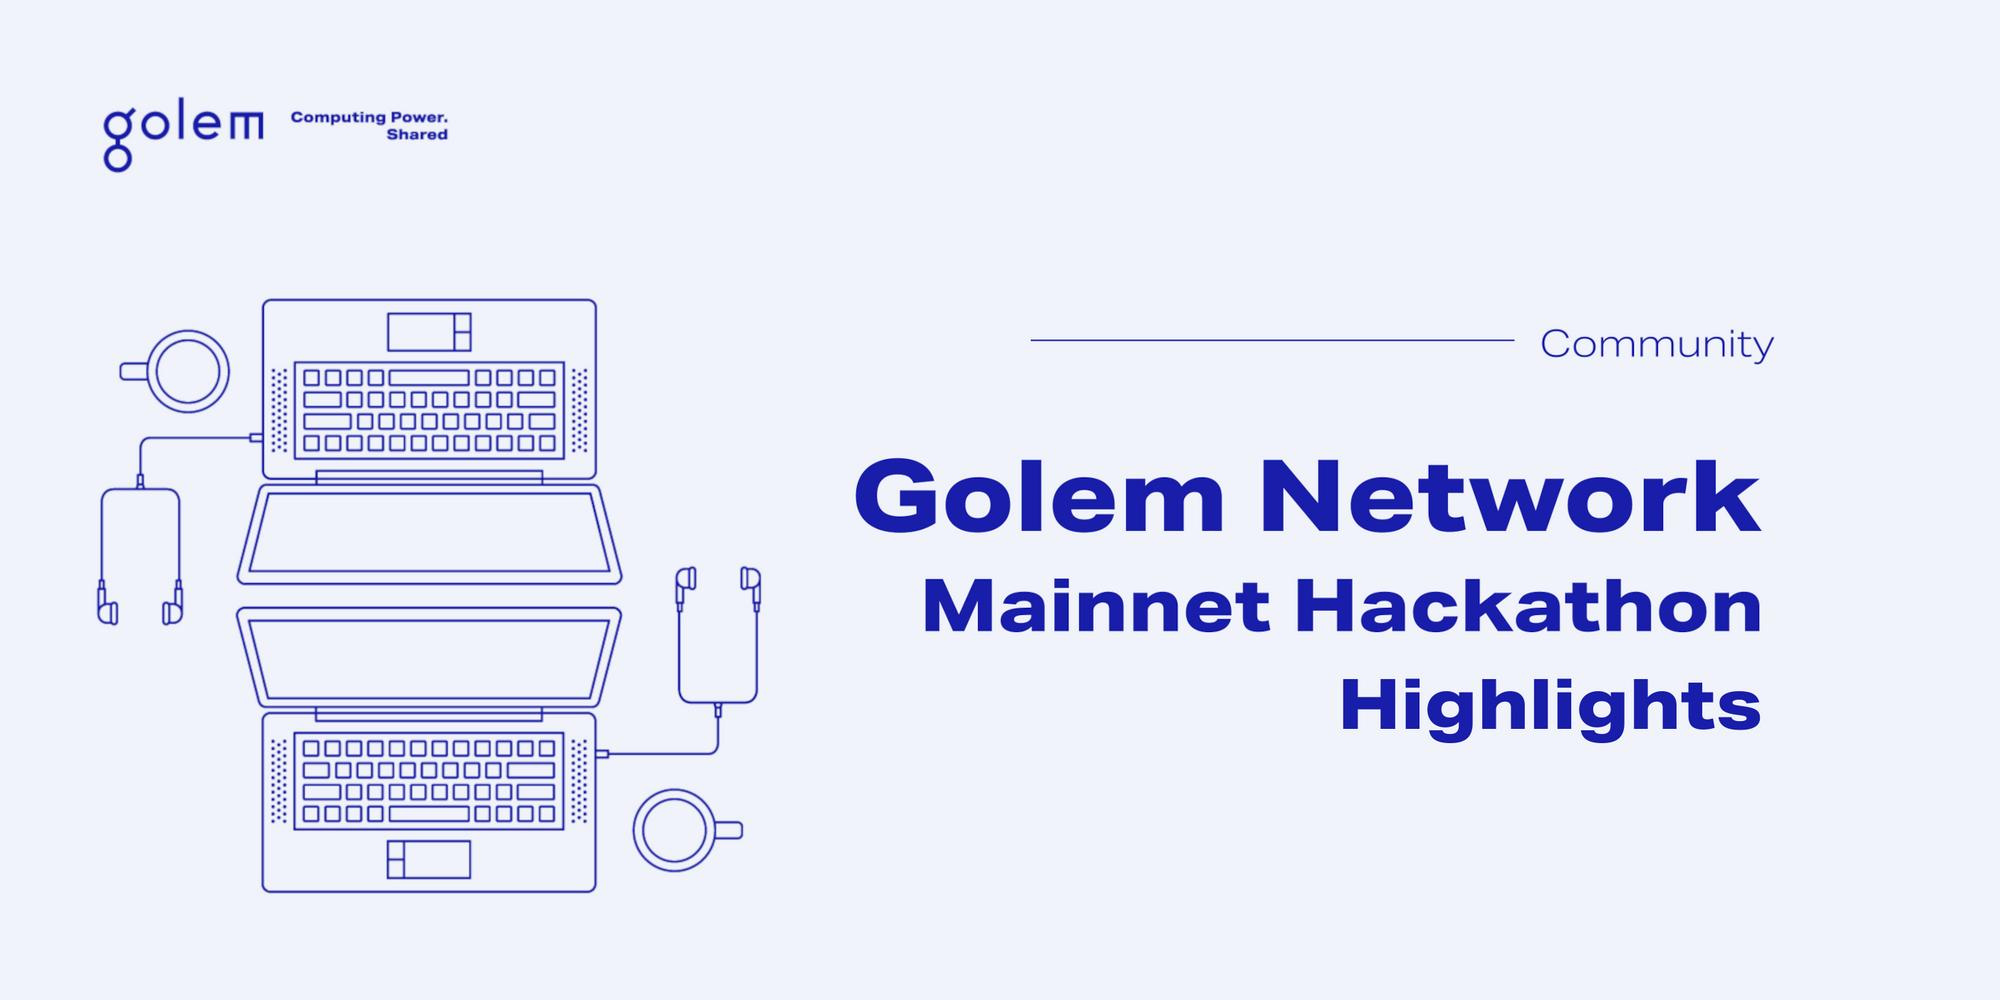 Golem Mainnet Hackathon Highlights